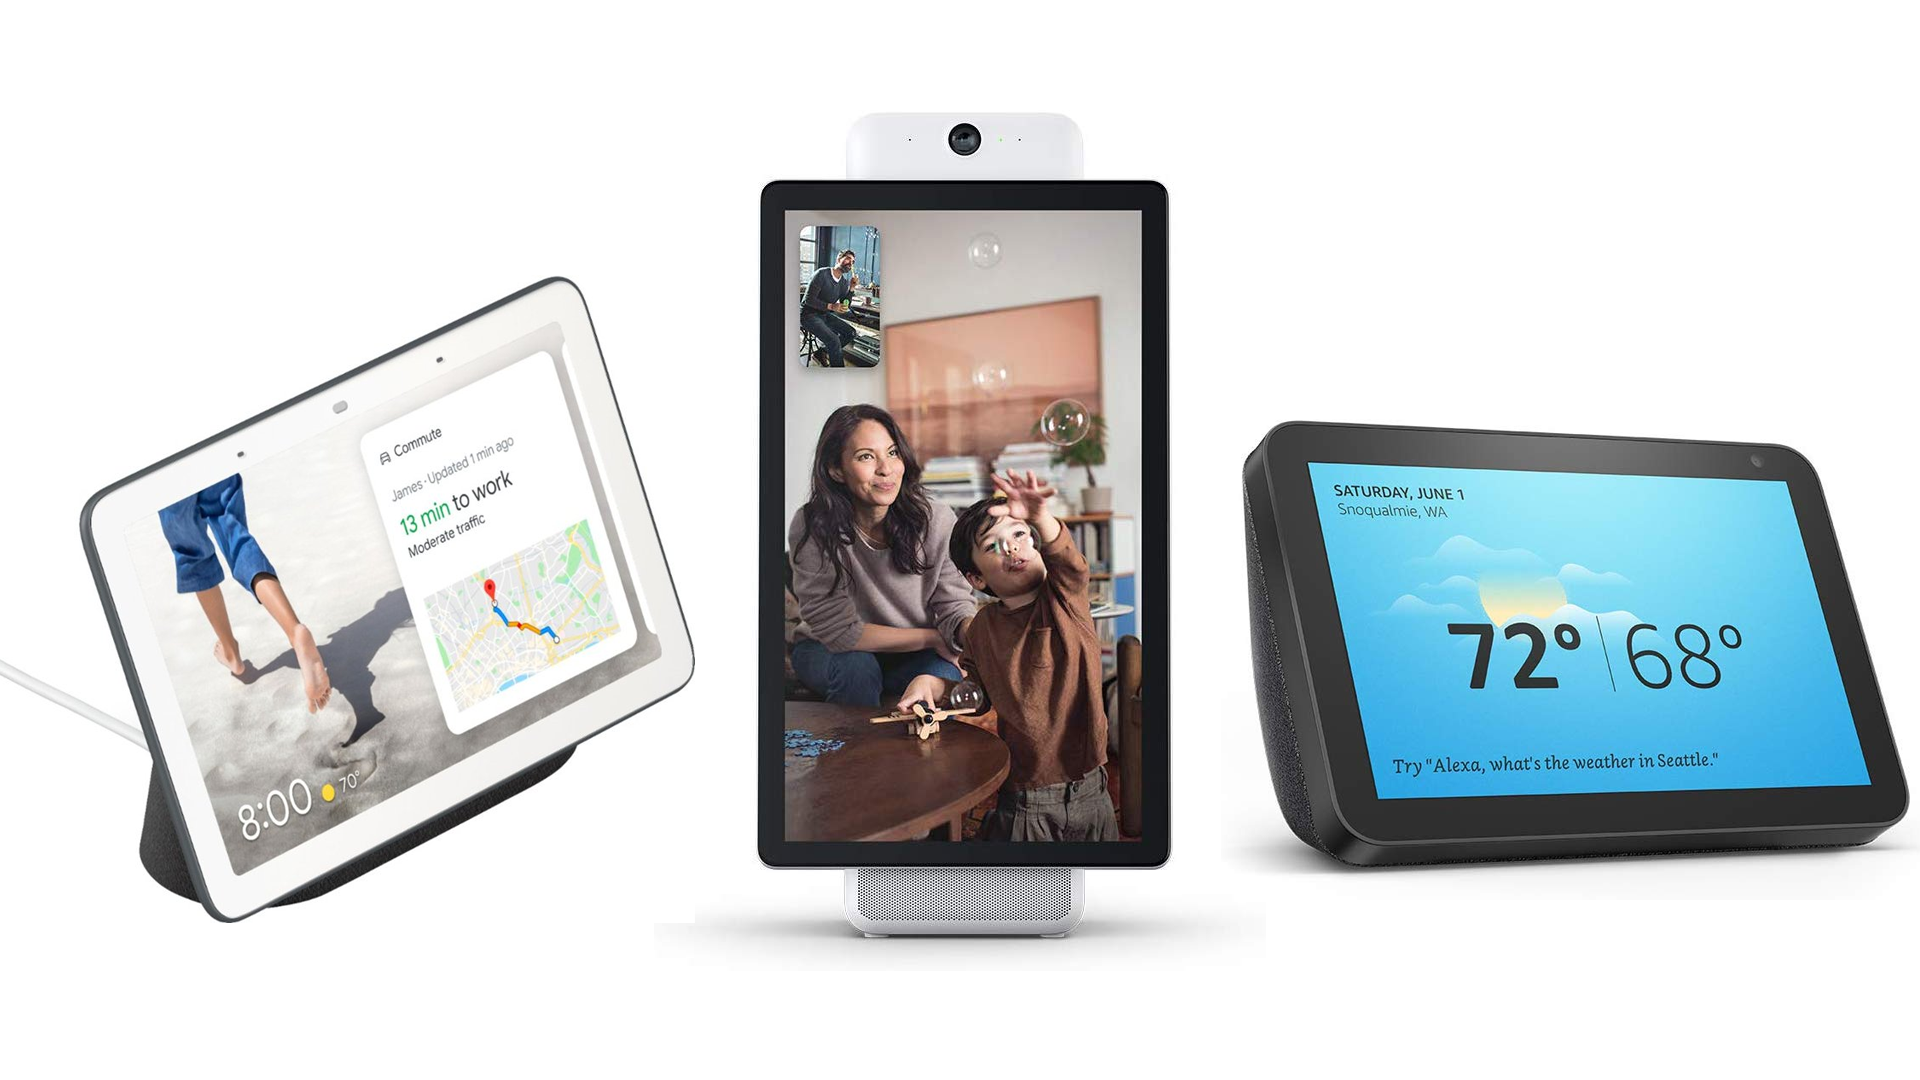 The Google Nest Hub, Facebook Portal, and Echo Show 8 smart displays.